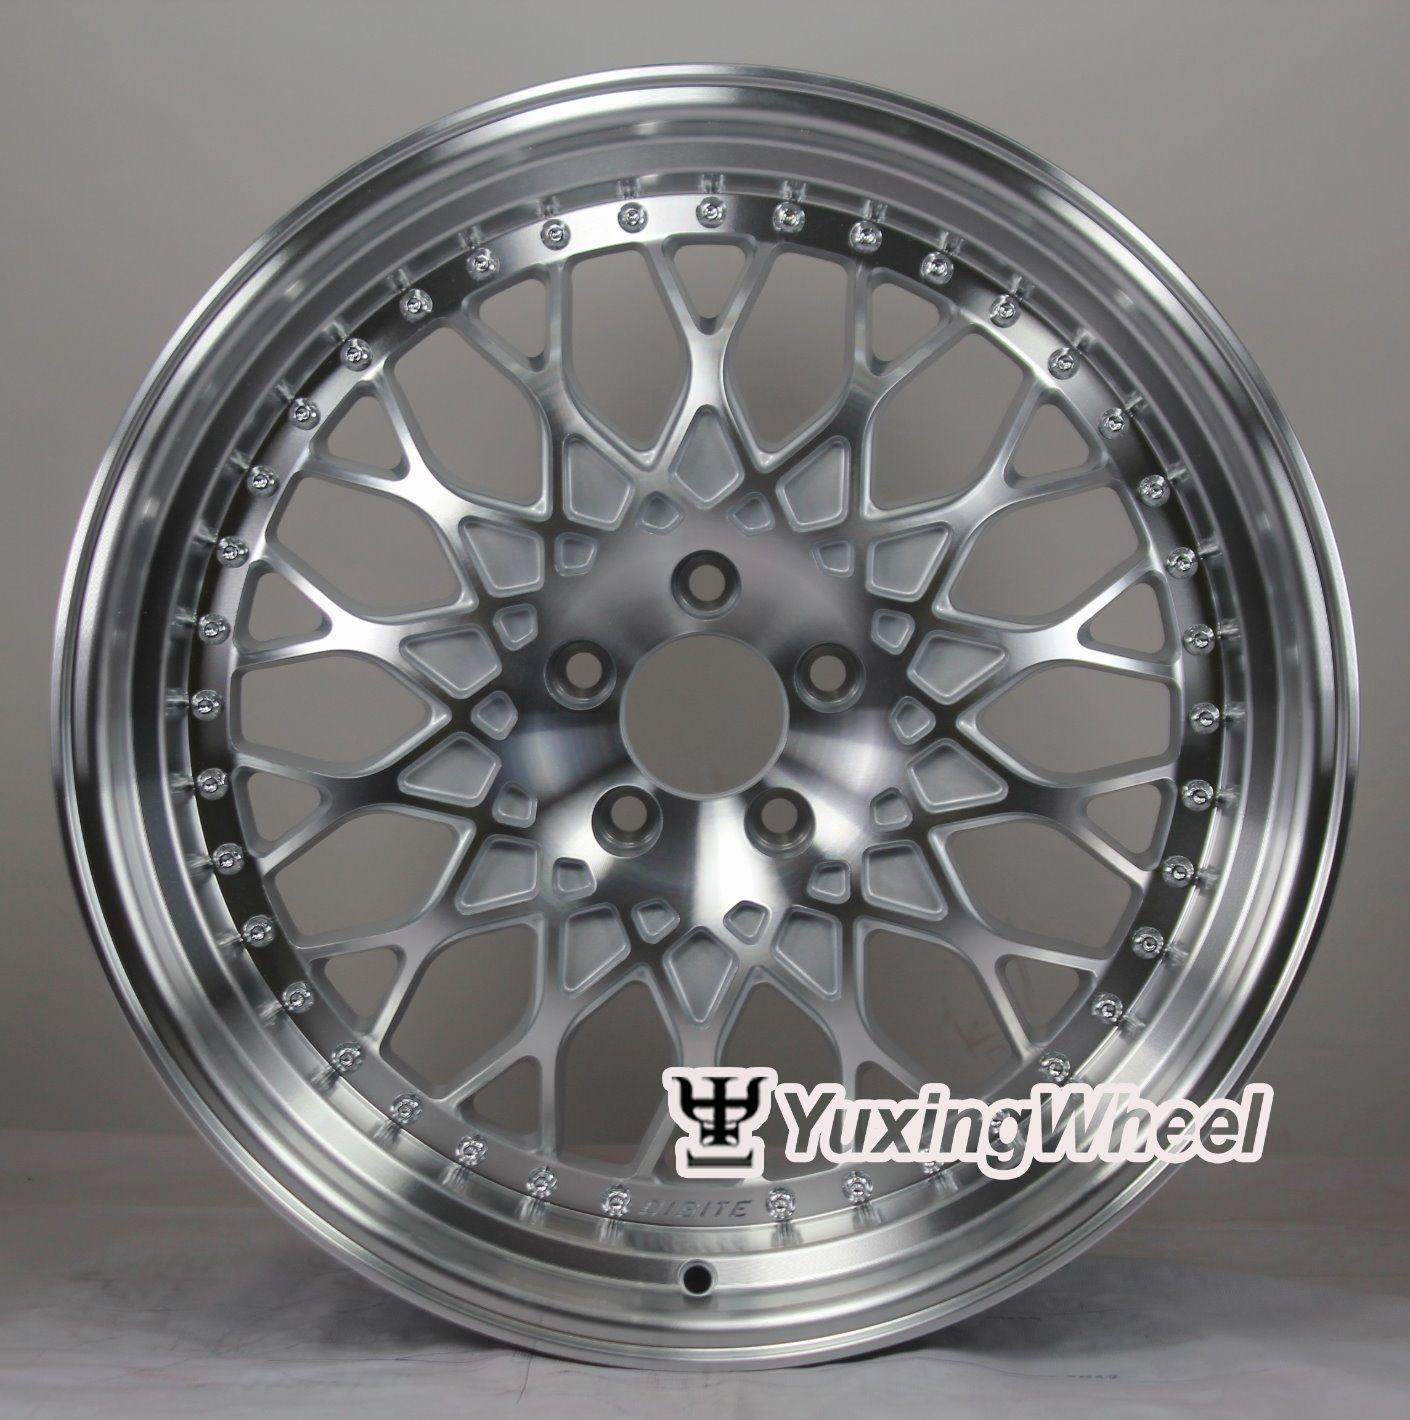 19 Inch Wheel Rims Replica Car Alloy Wheel